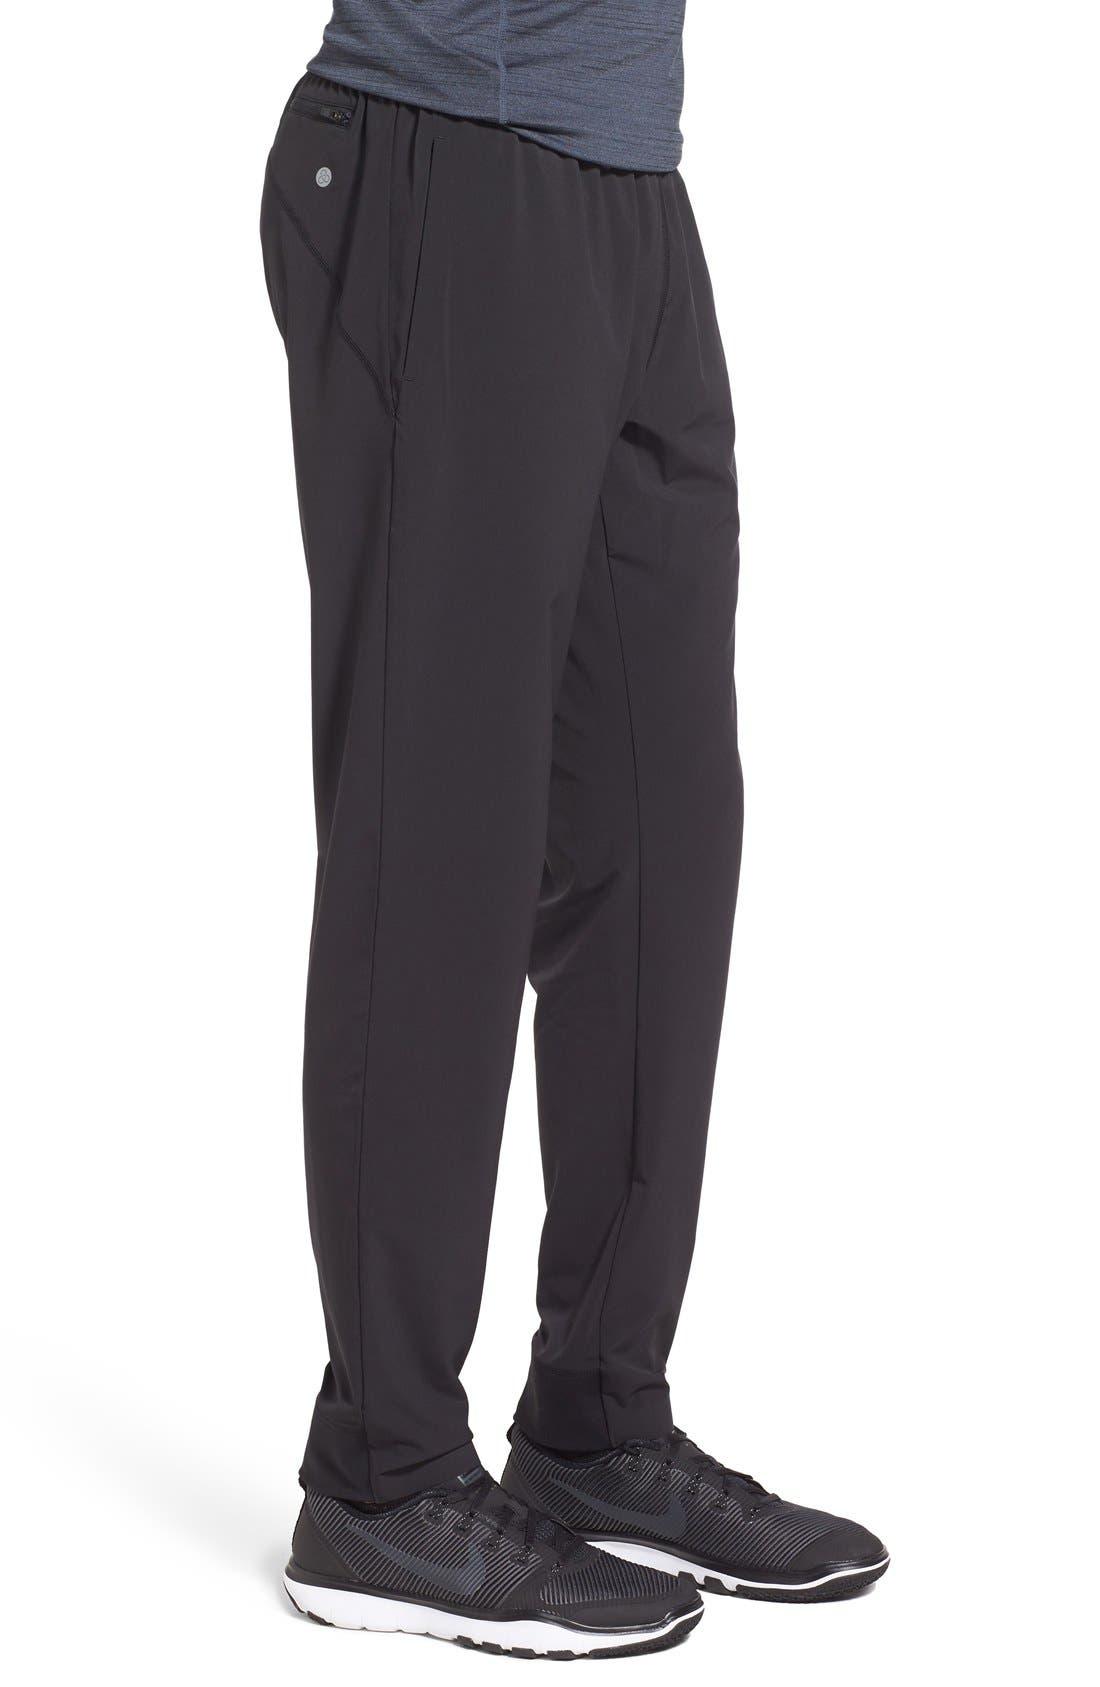 Alternate Image 3  - Zella 'Graphite' Tapered Athletic Pants